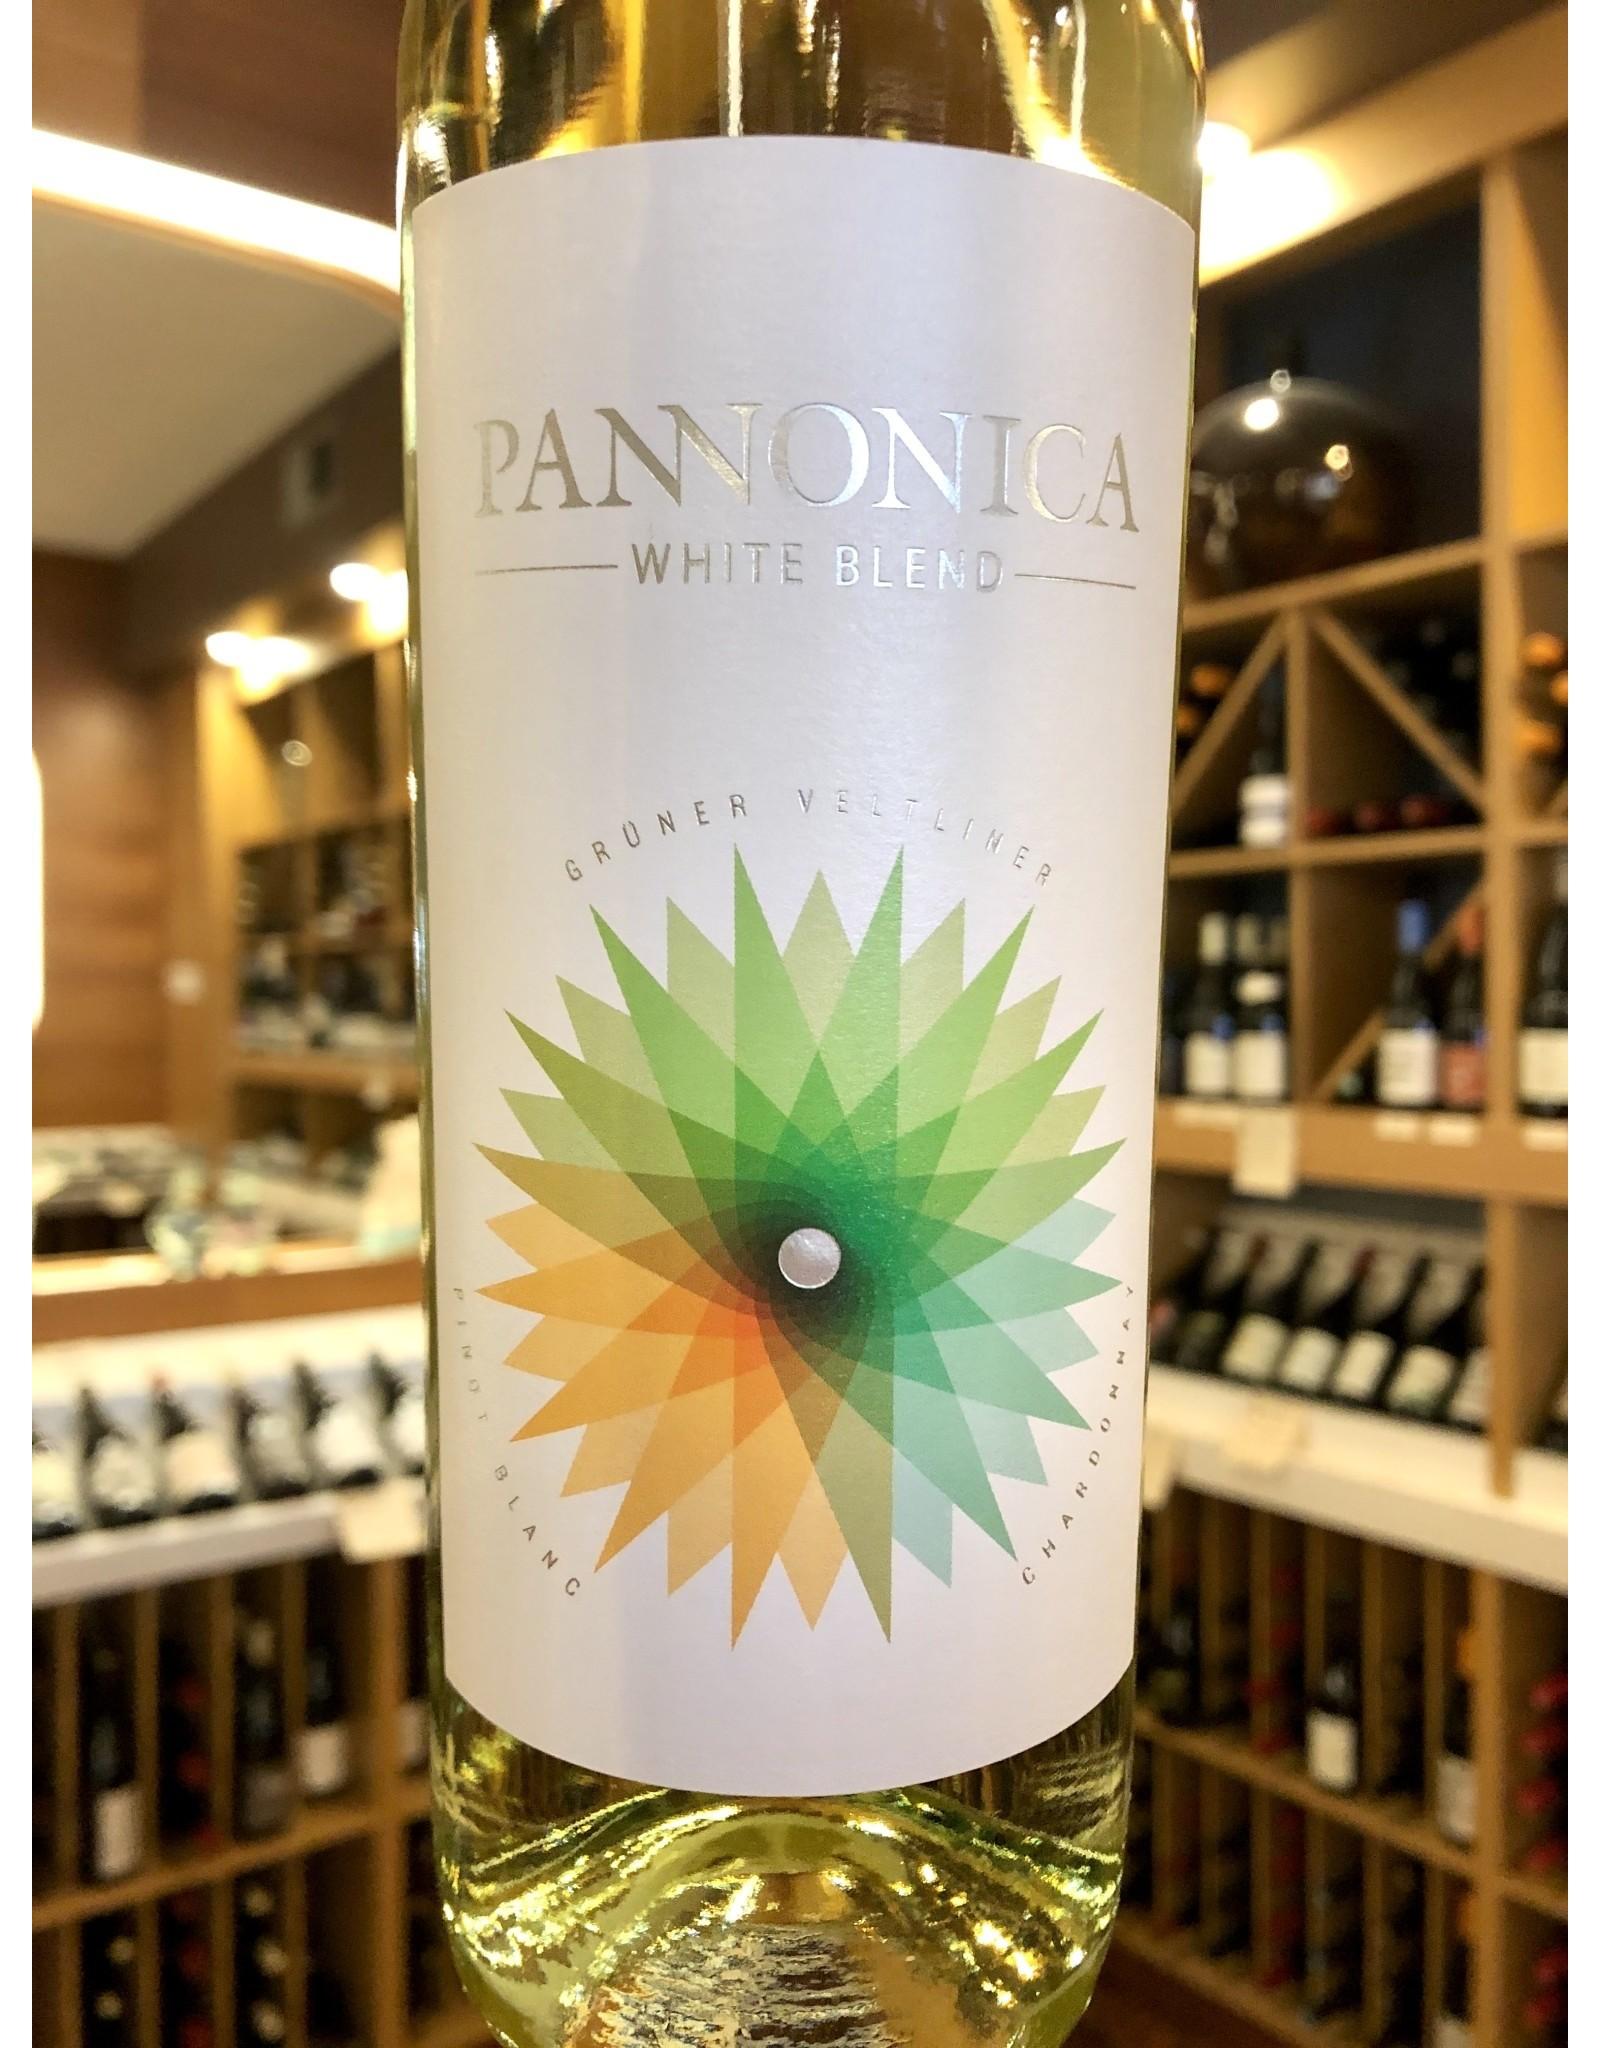 Pannonica White Blend - 750 ML